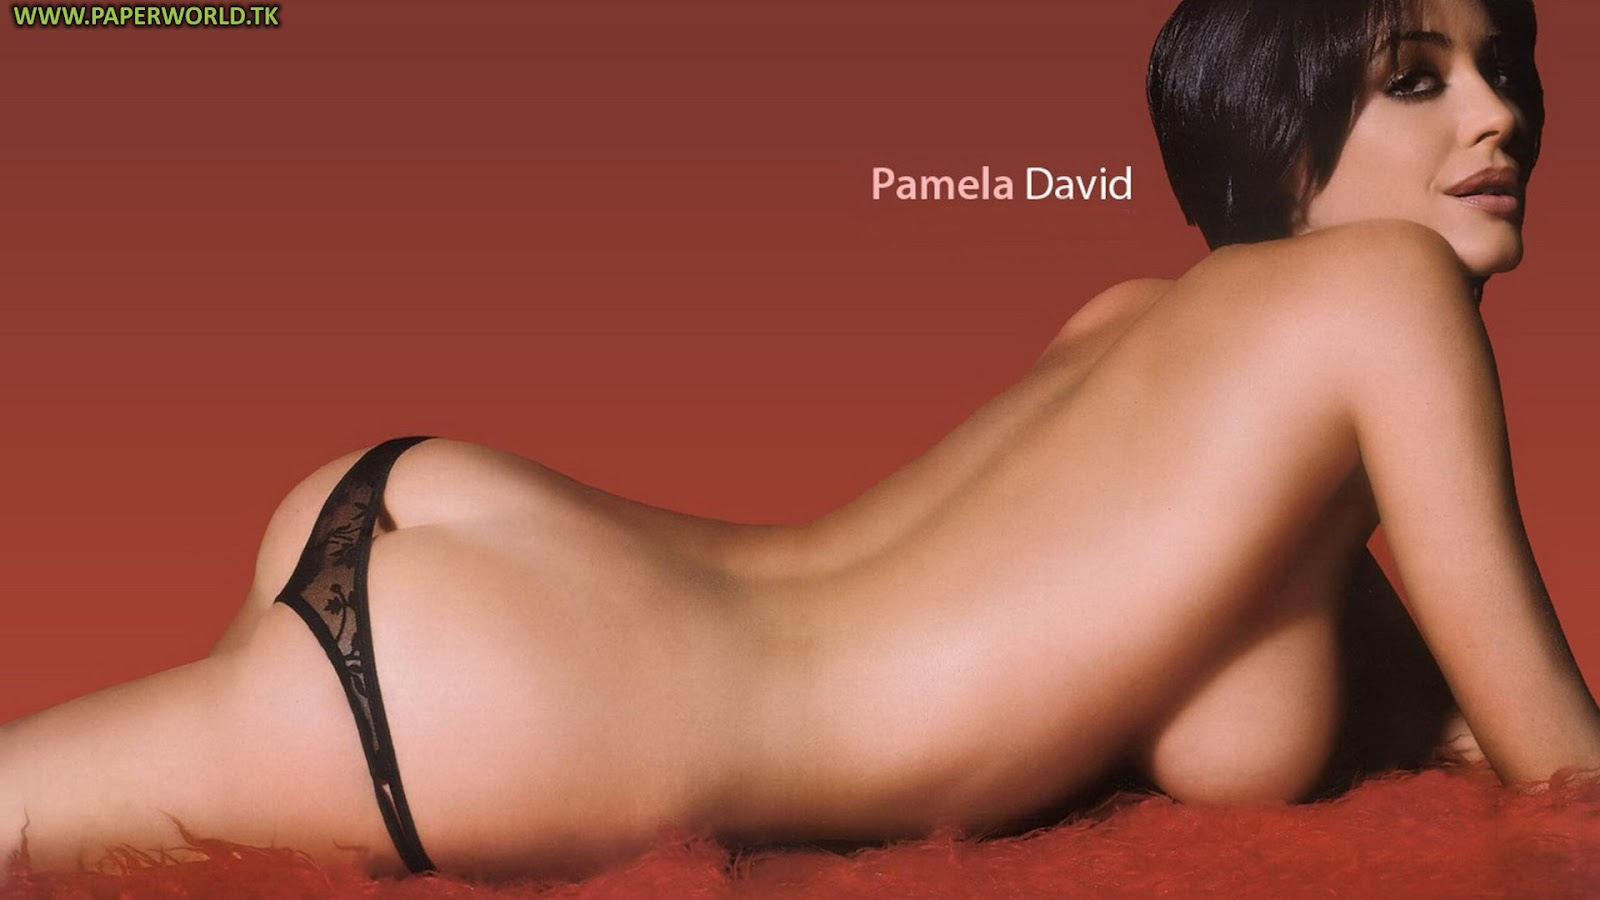 pamela david nude